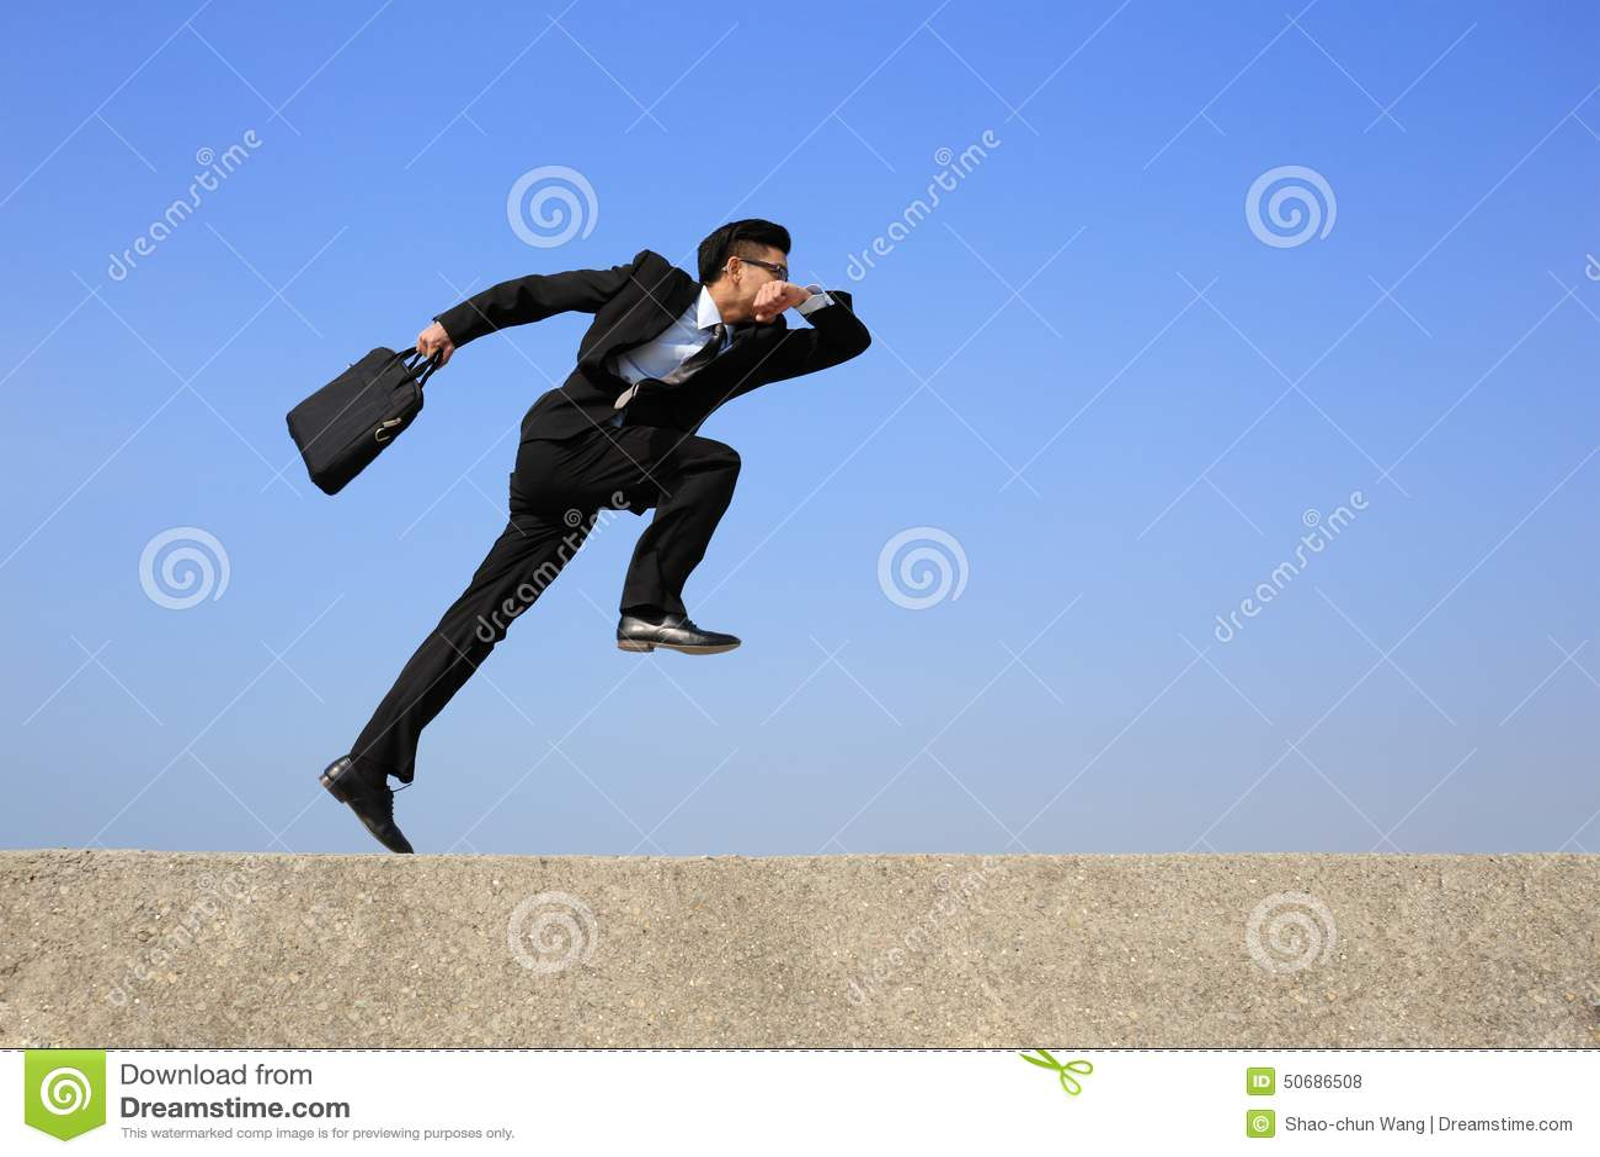 Download 愉快的商人奔跑 库存照片. 图片 包括有 事故, 喜悦, 繁忙, 无忧无虑, 愉快, 仓促, 快速, 上涨 - 50686508